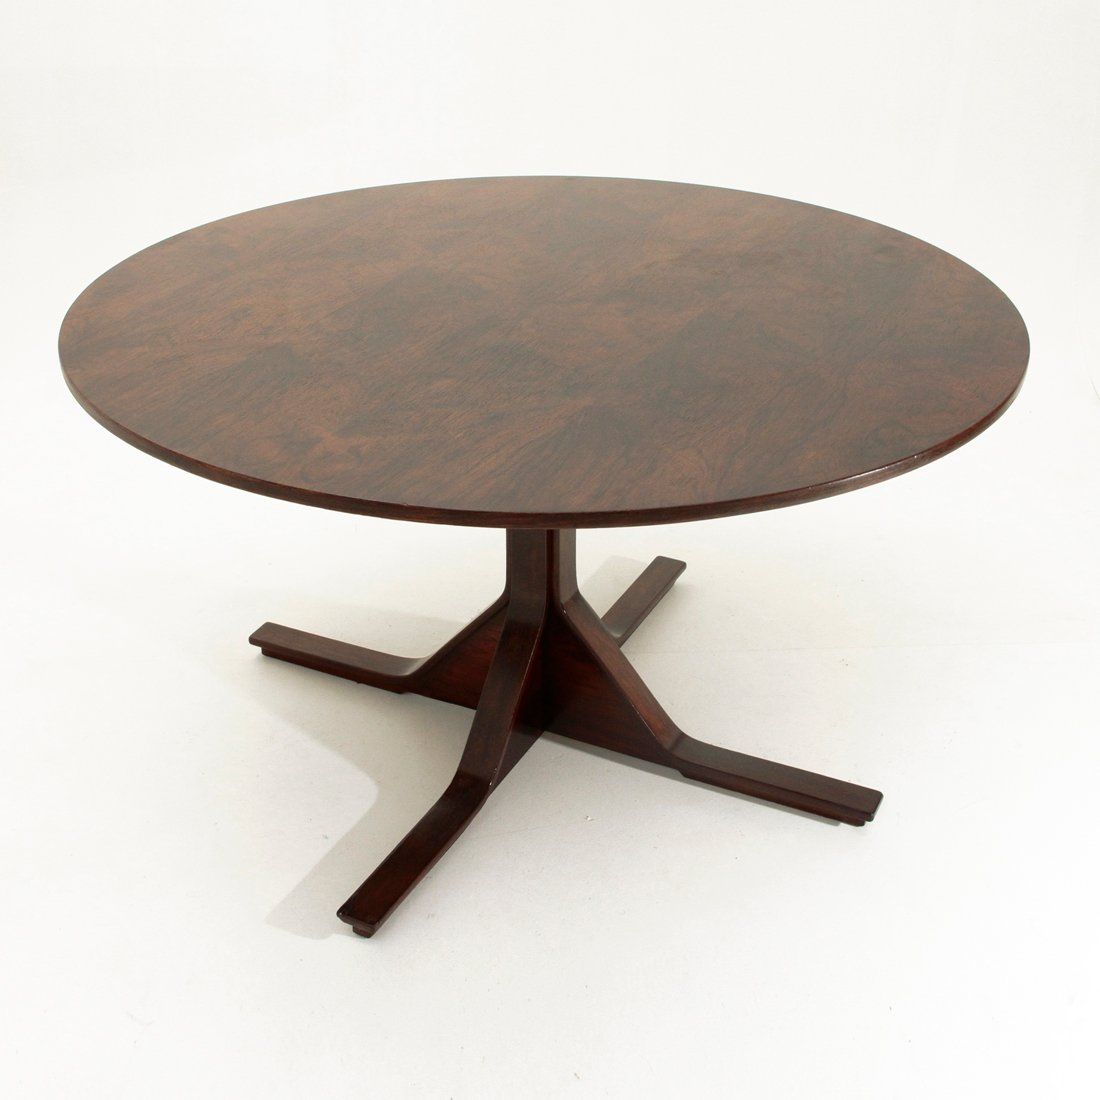 mid century modell 522 esstisch von gianfranco frattini f r bernini bei pamono kaufen. Black Bedroom Furniture Sets. Home Design Ideas